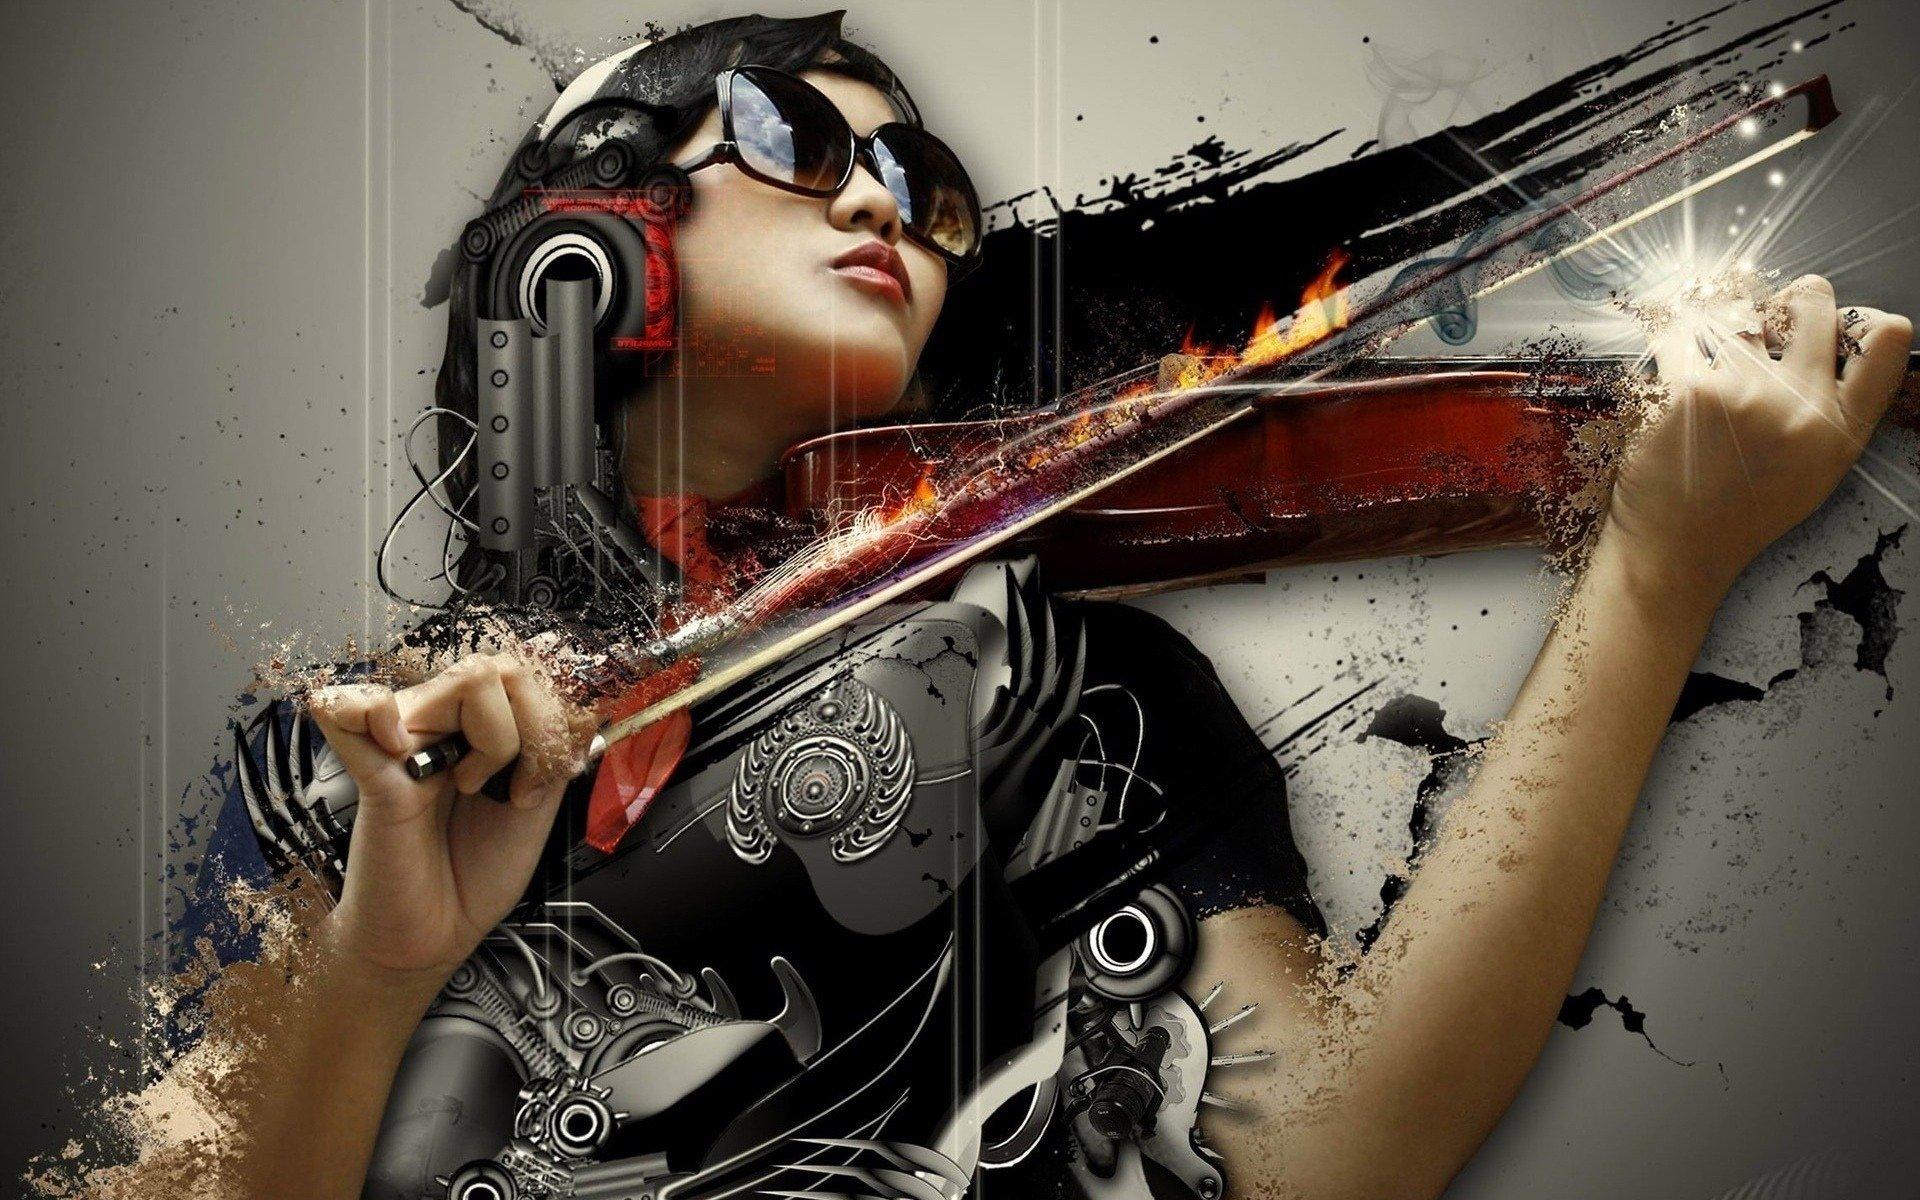 Art fashion music culture